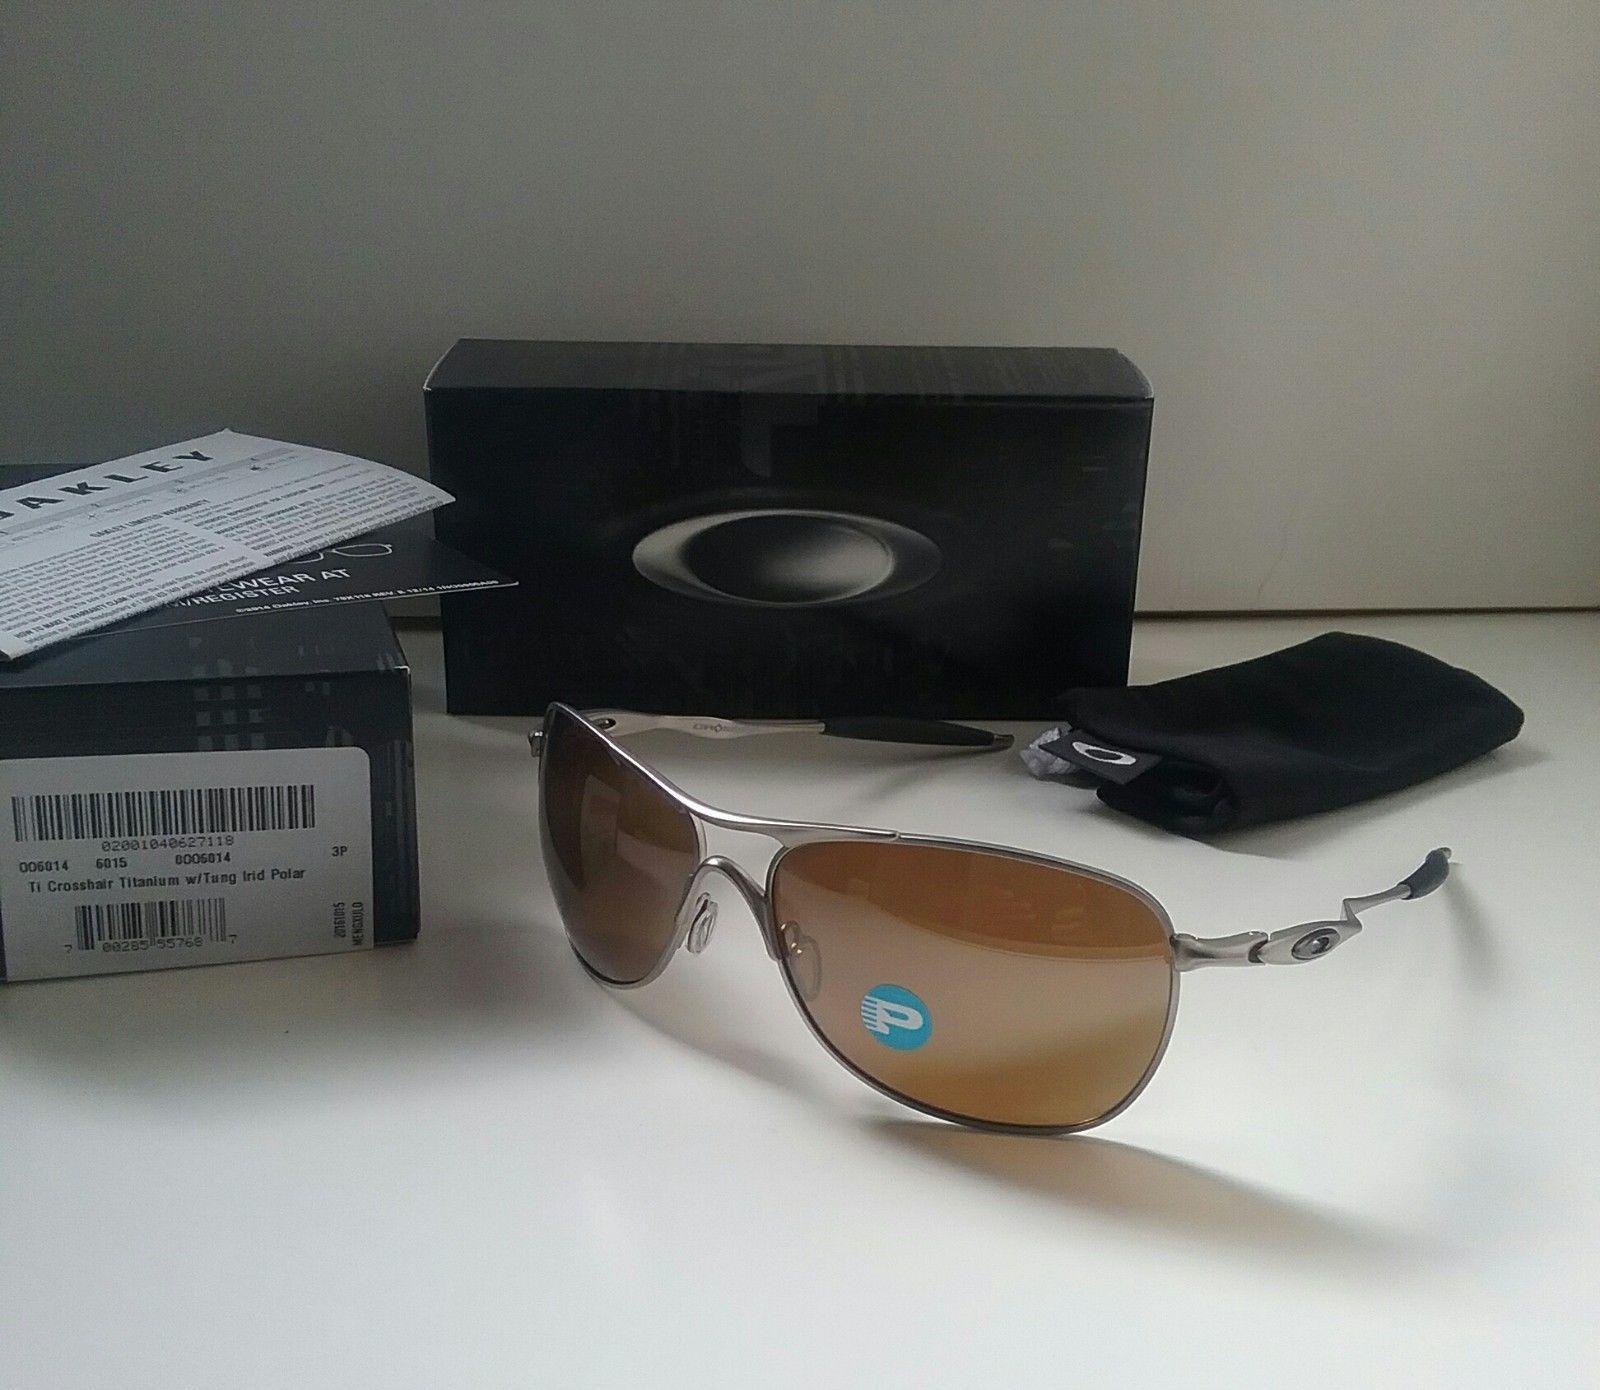 dadd7f1099 óculos Oakley Crosshair Titanium Tungsten Iridium Polarized « One ...